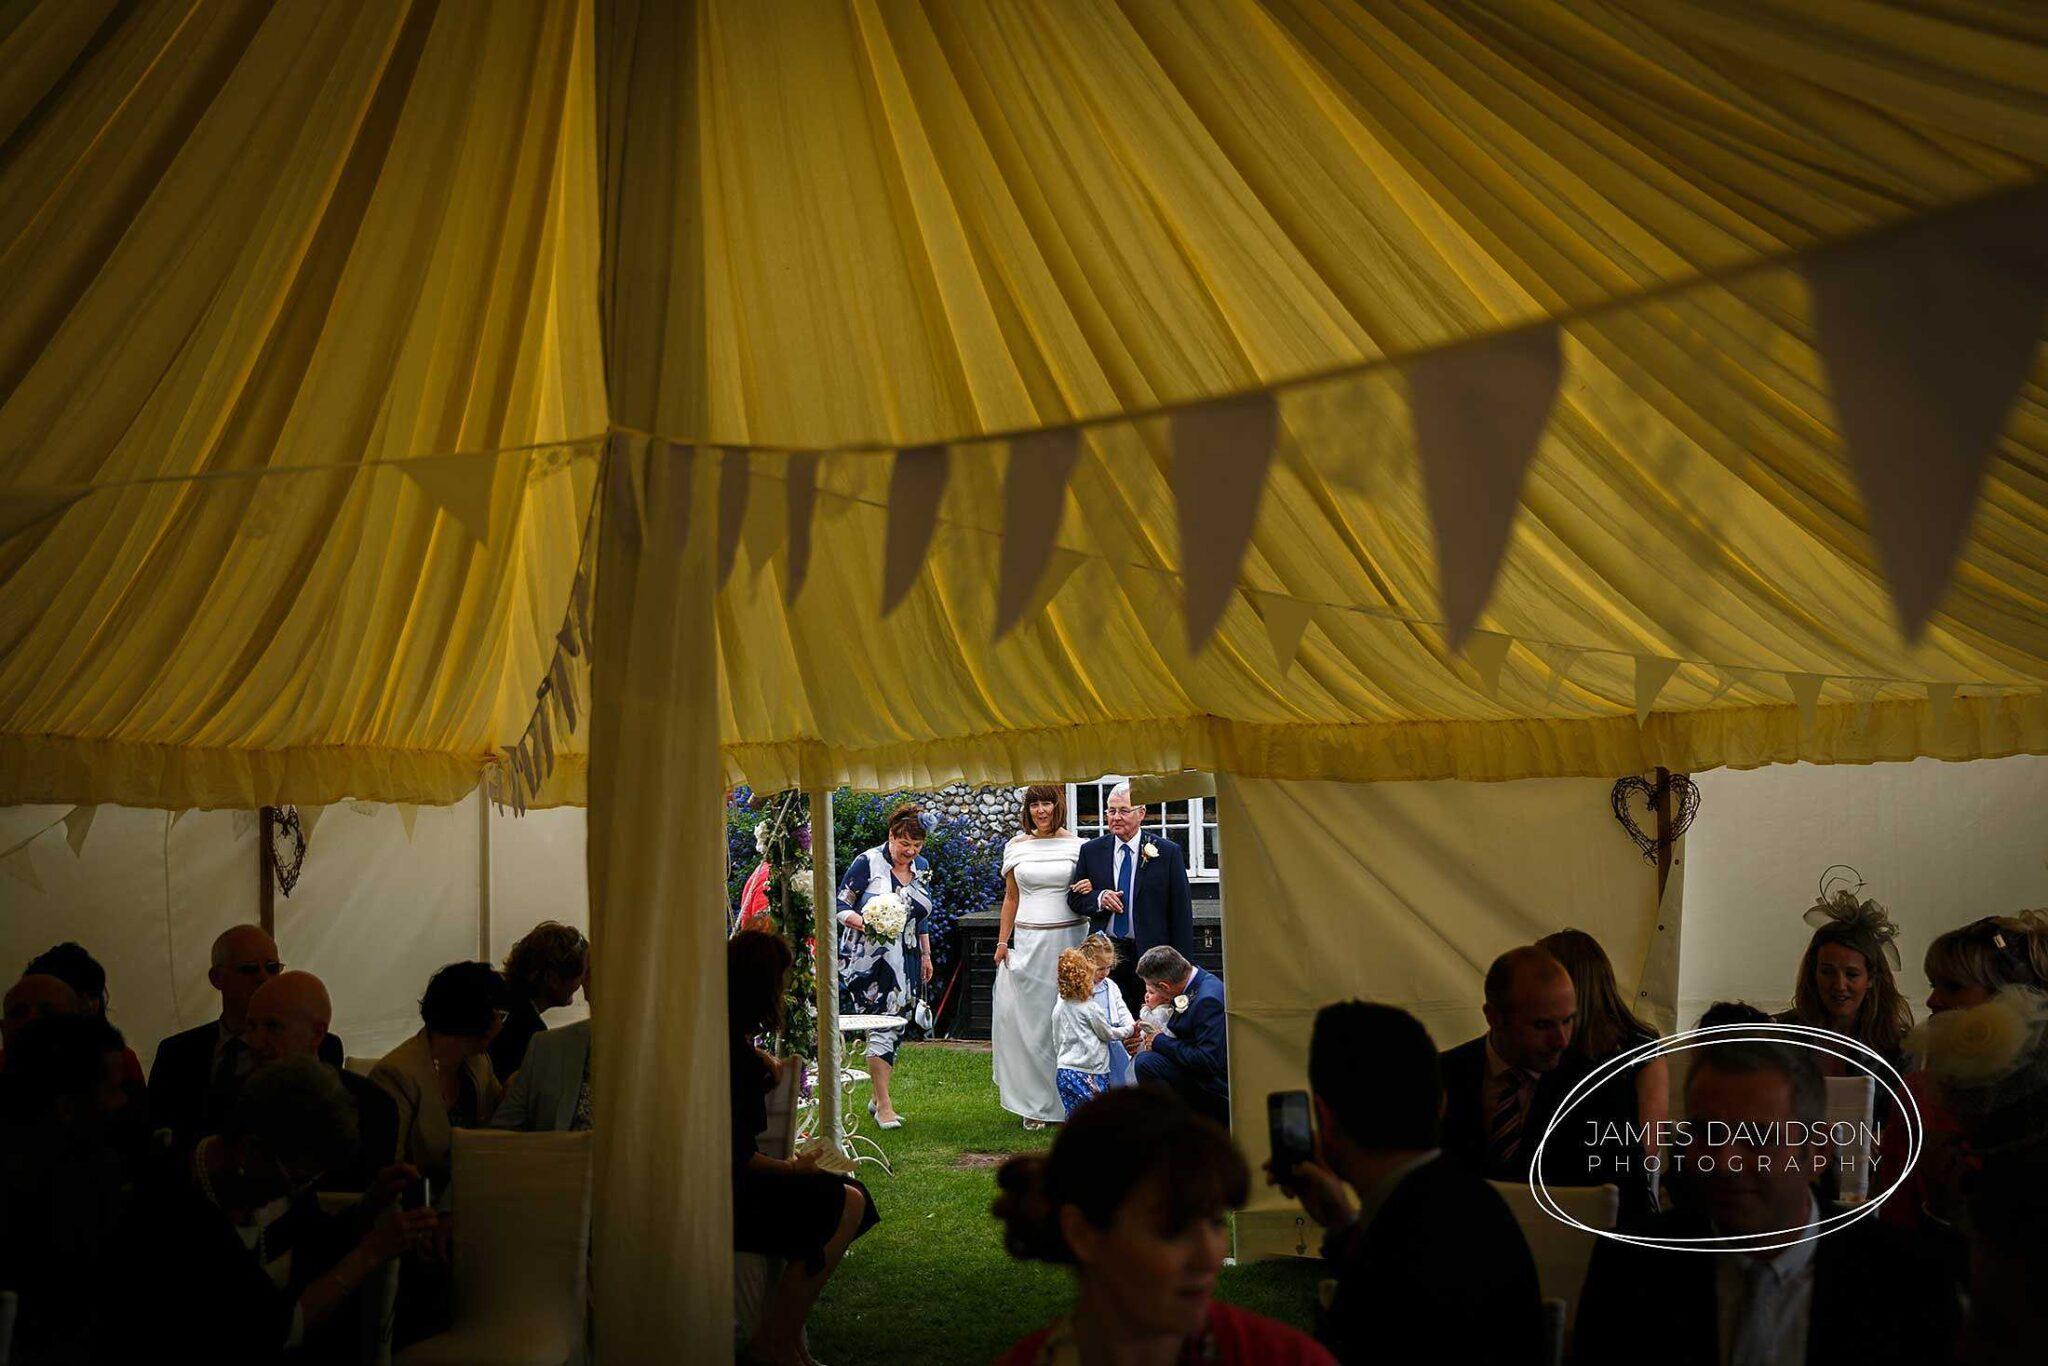 Cley windmill wedding photos